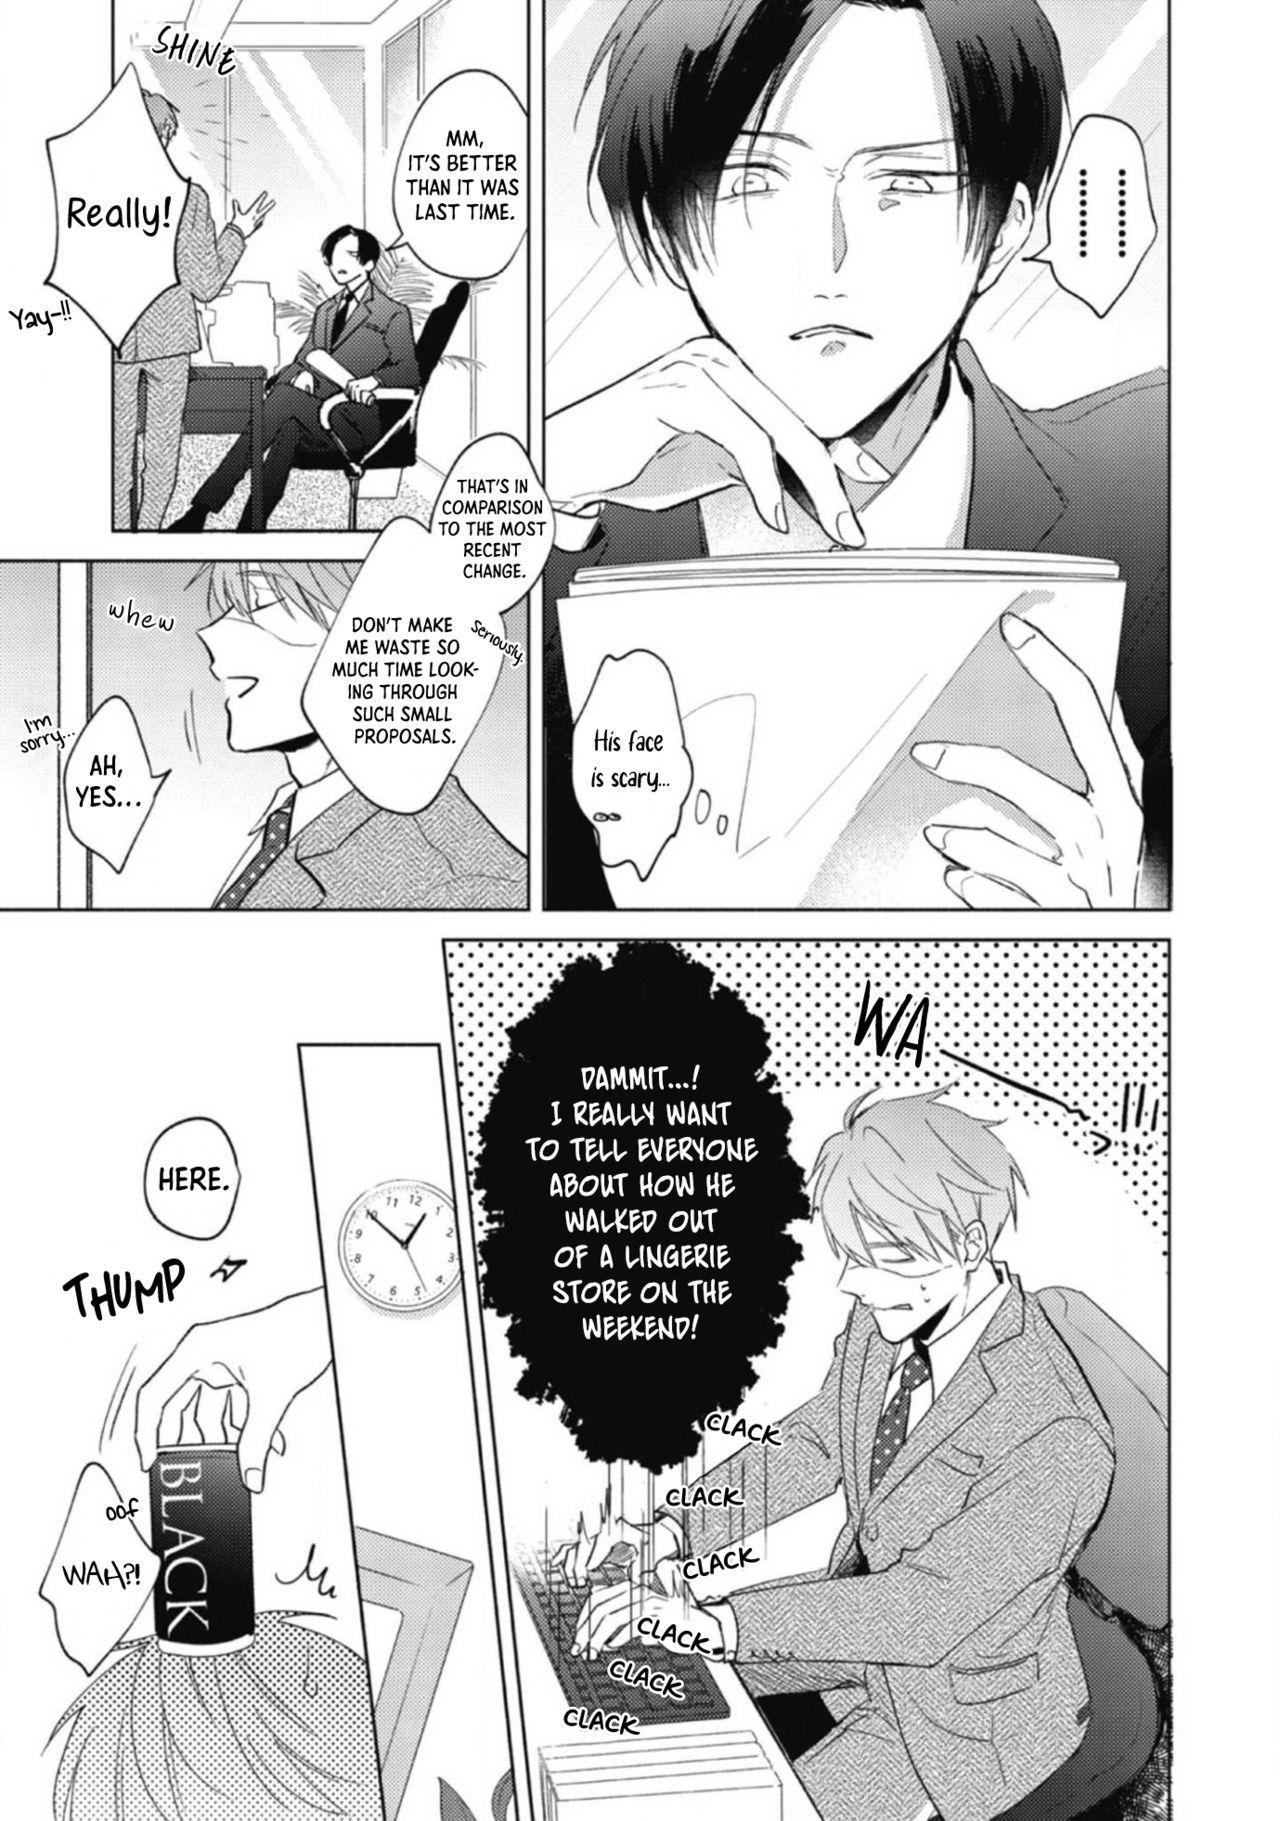 Oni Joushi Gokudera-san wa Abakaretai   My demon boss, Gokudera wants to be exposed 1 14